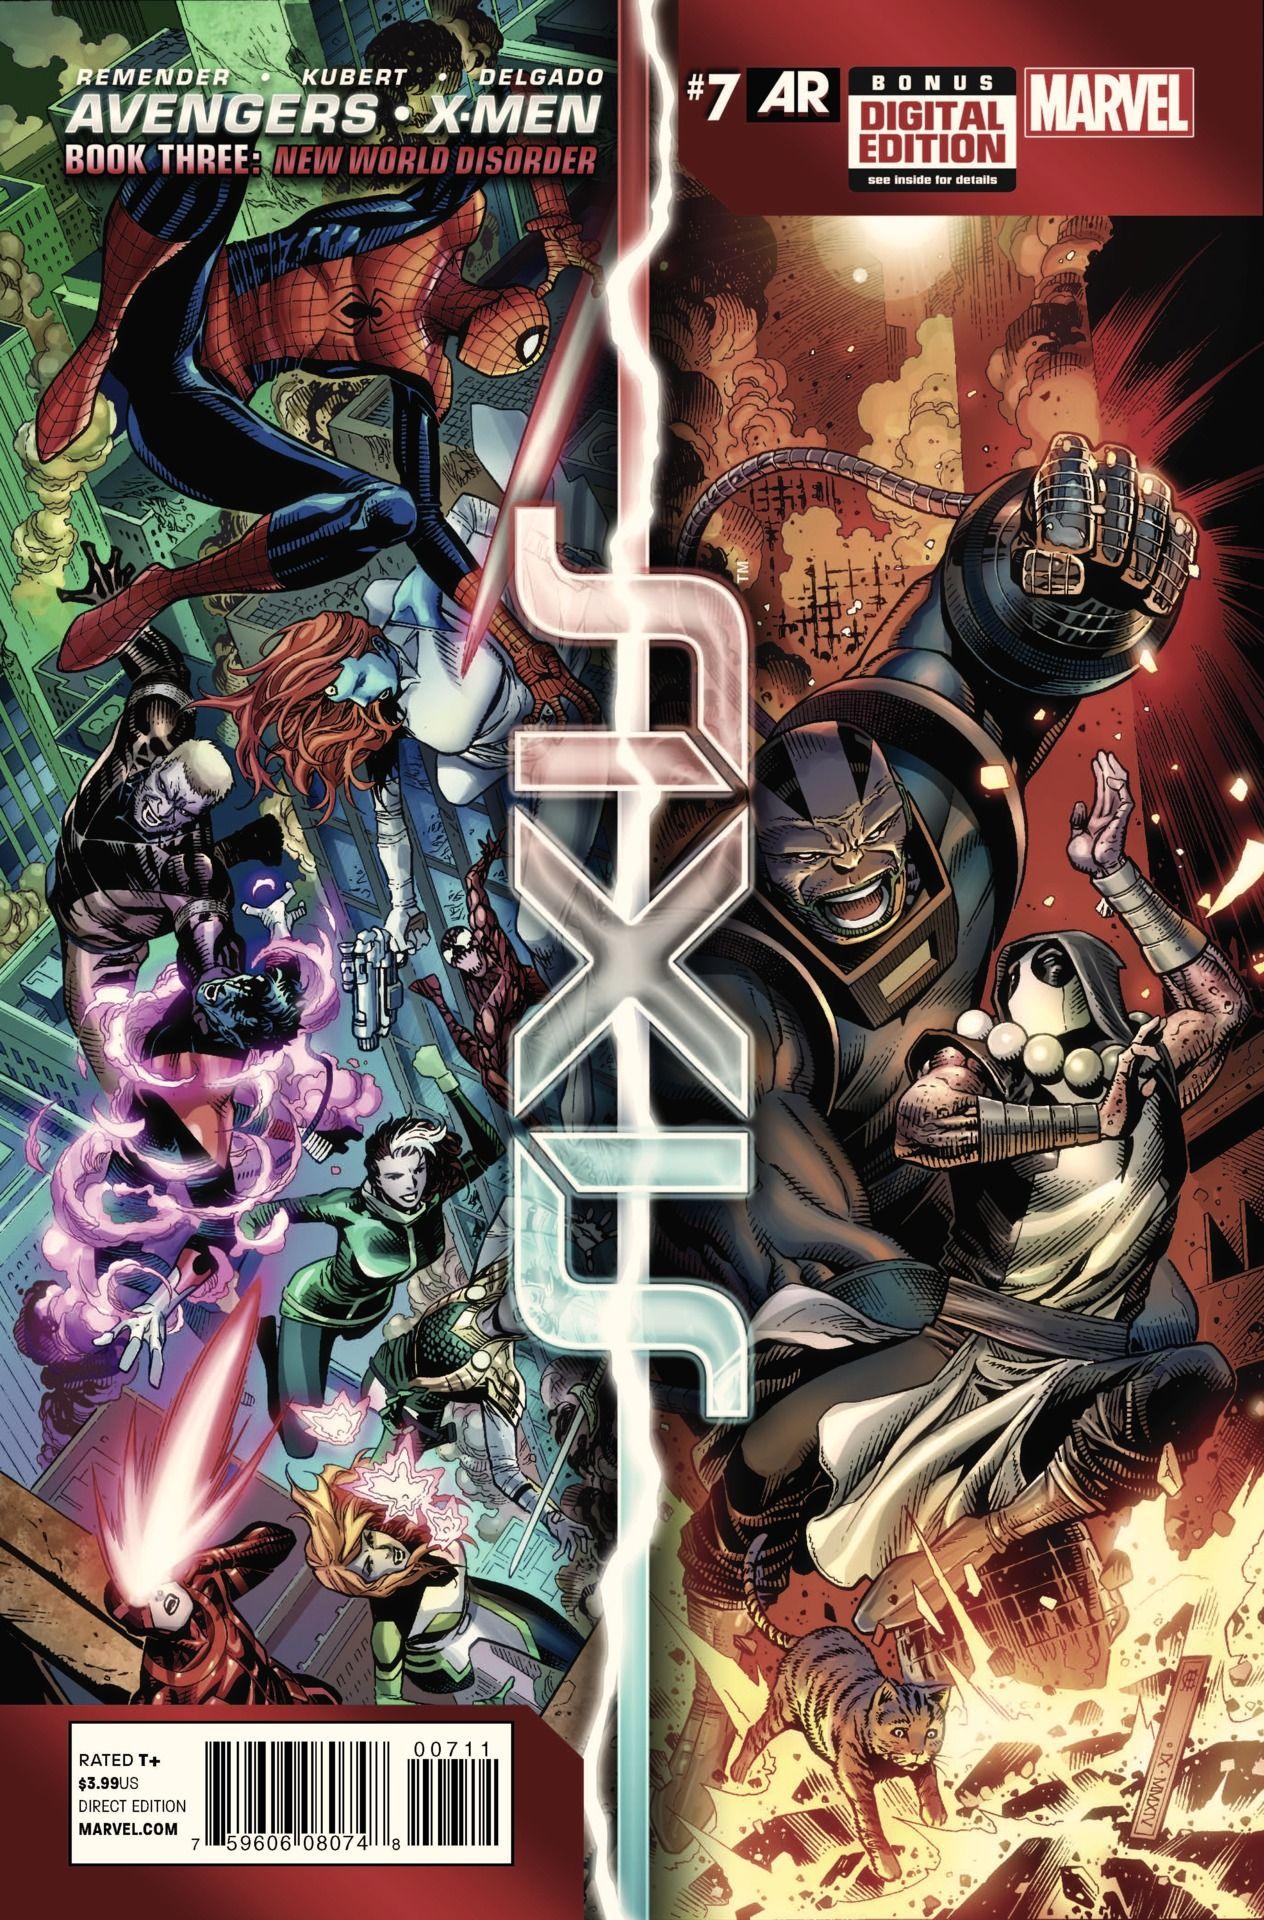 AVENGERS & X-MEN: AXIS #7 First Look at AVENGERS & X-MEN: AXIS #7 - Comic Vine